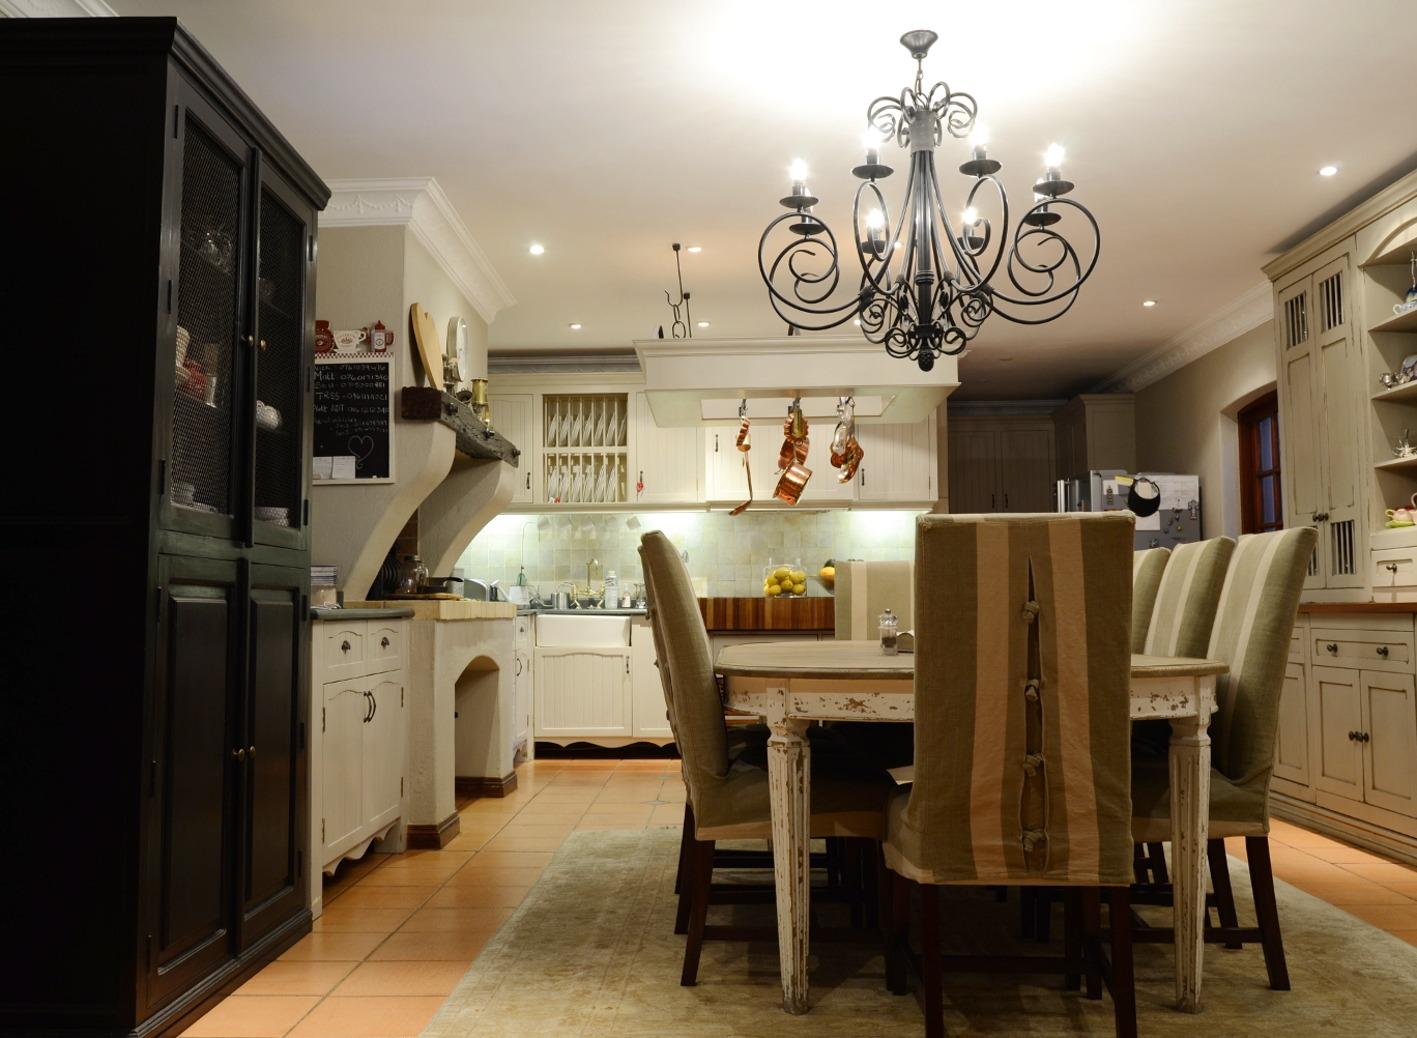 kitchen.jpeg